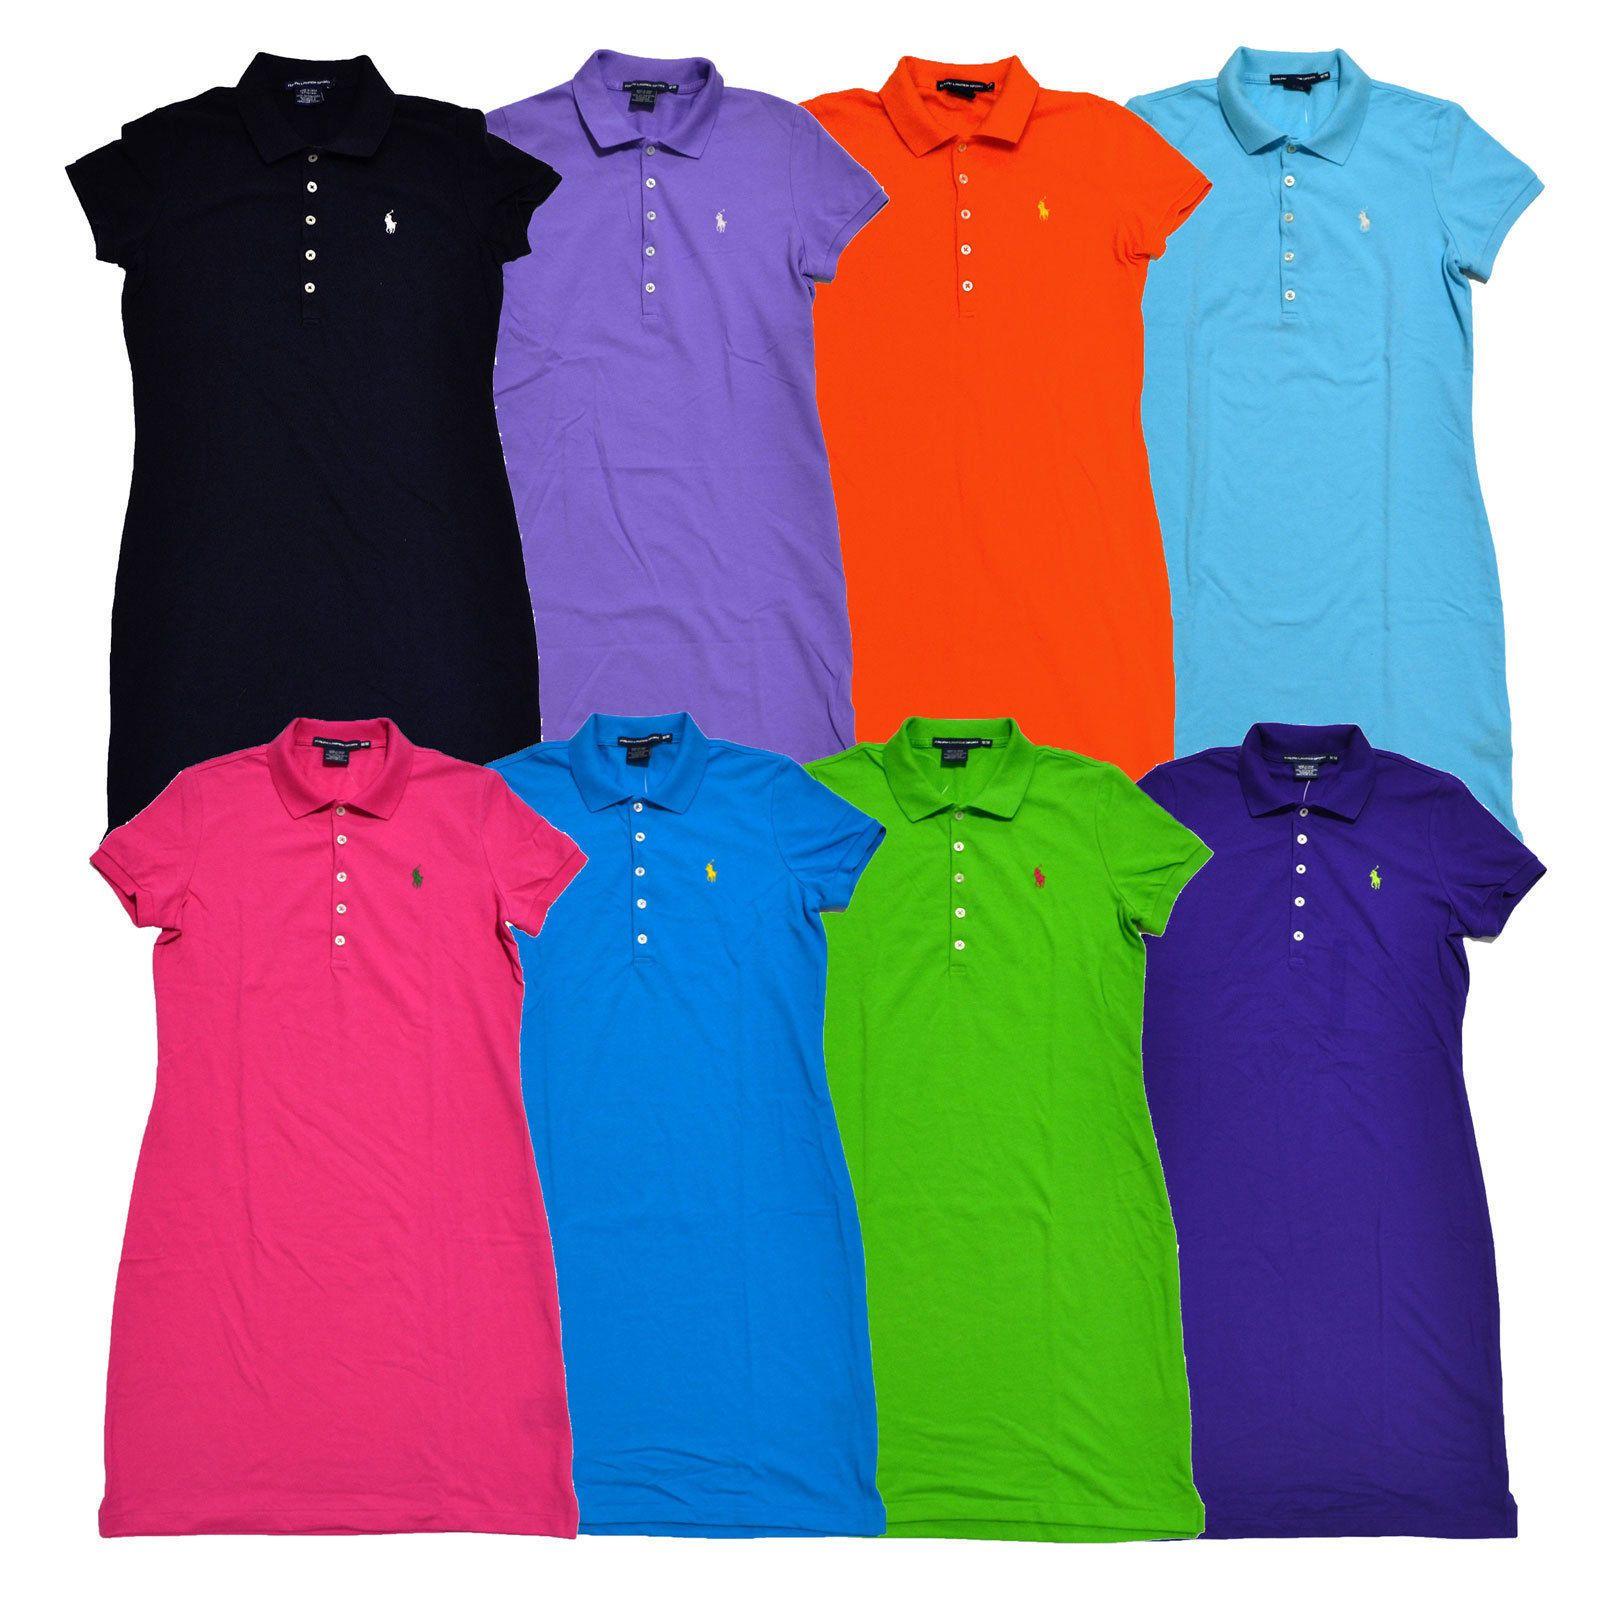 Ralph Lauren Womens Dress Tennis Mesh Classic Pony Logo New Xs S M L Xl